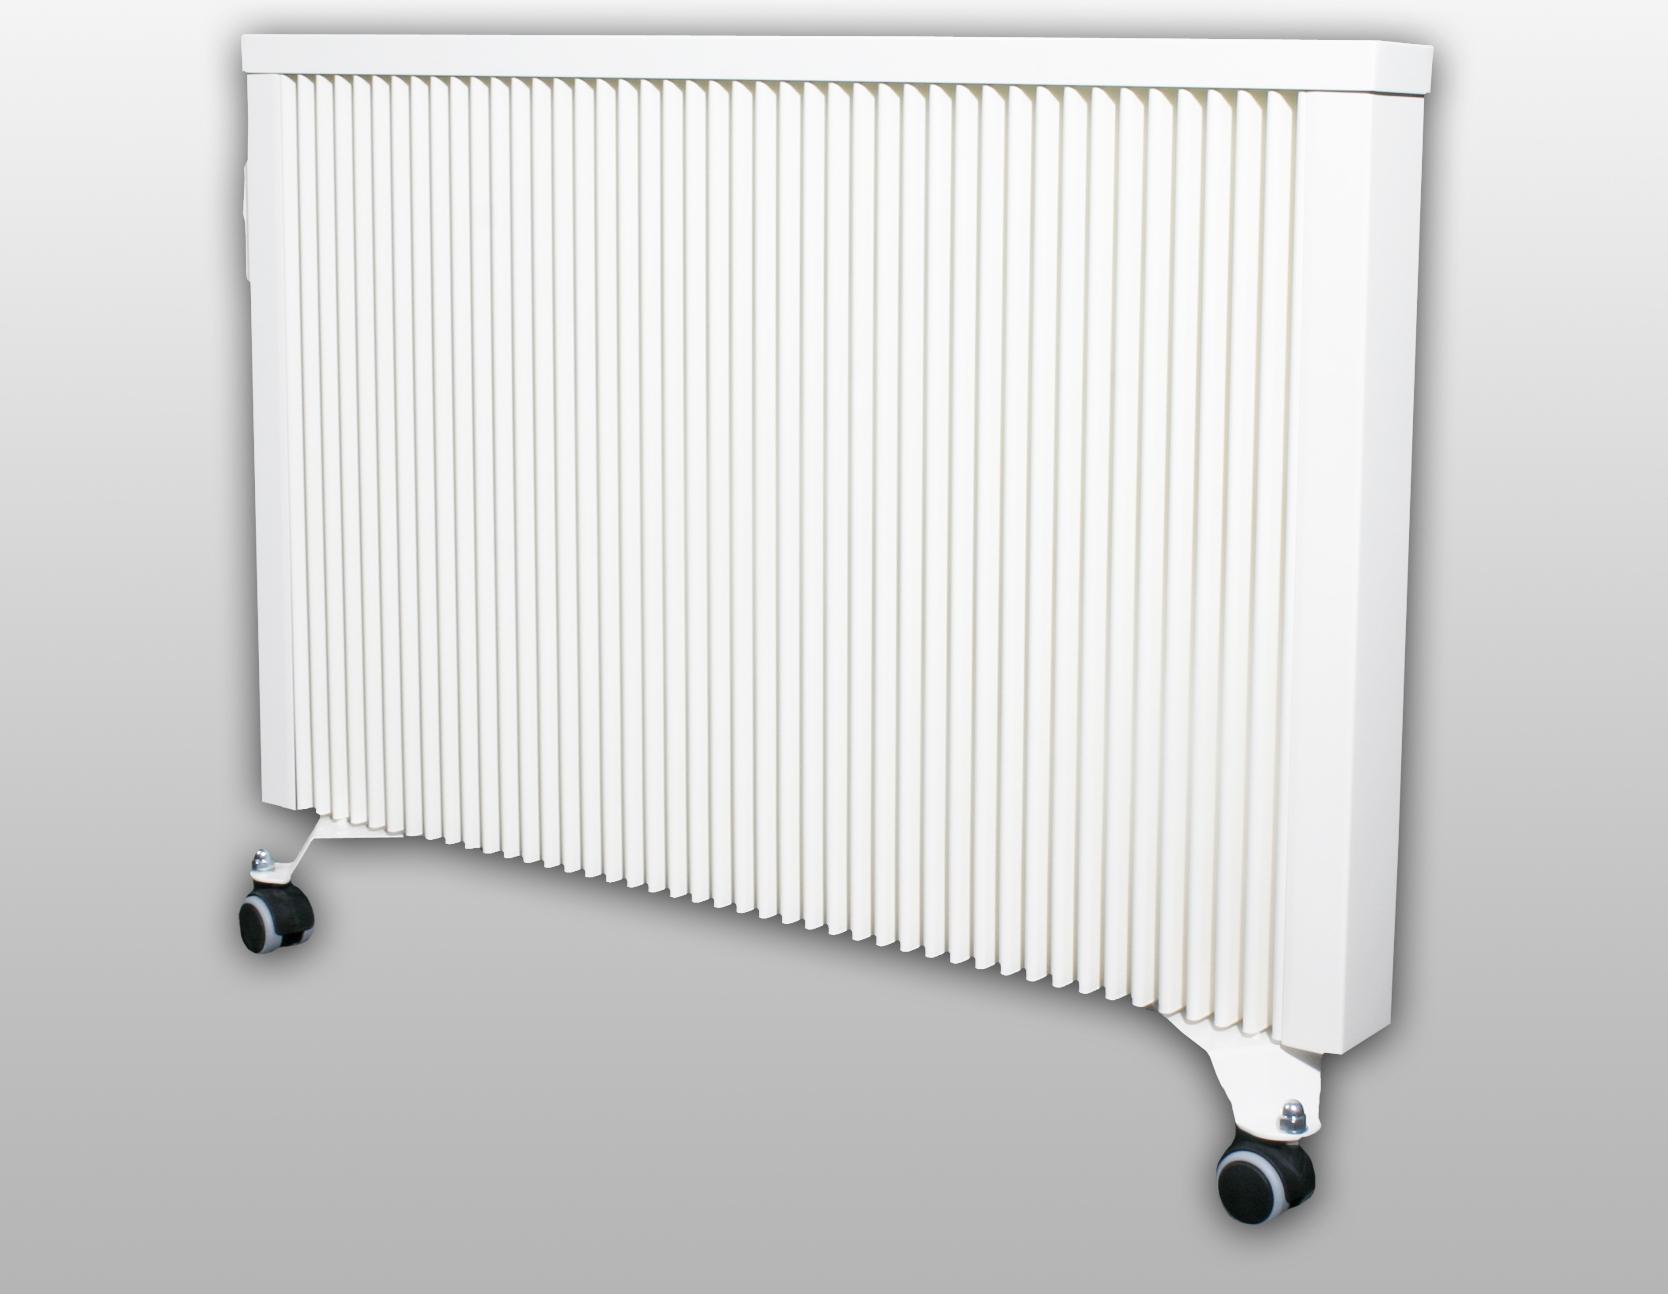 Topný panel série H, TYP H80, 800 W